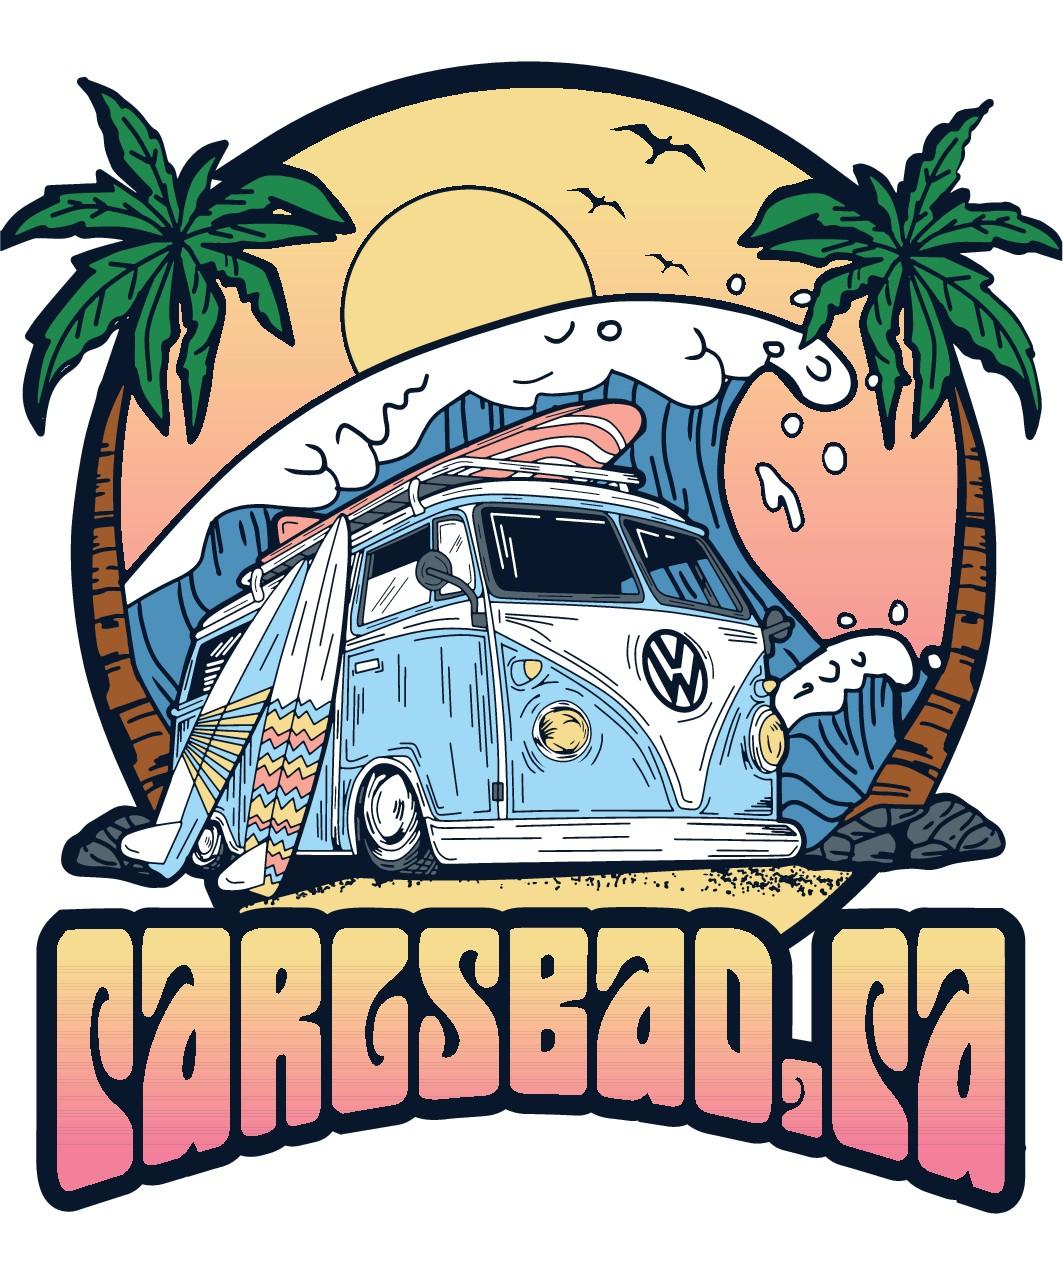 Design a beach design for Carlsbad,Ca